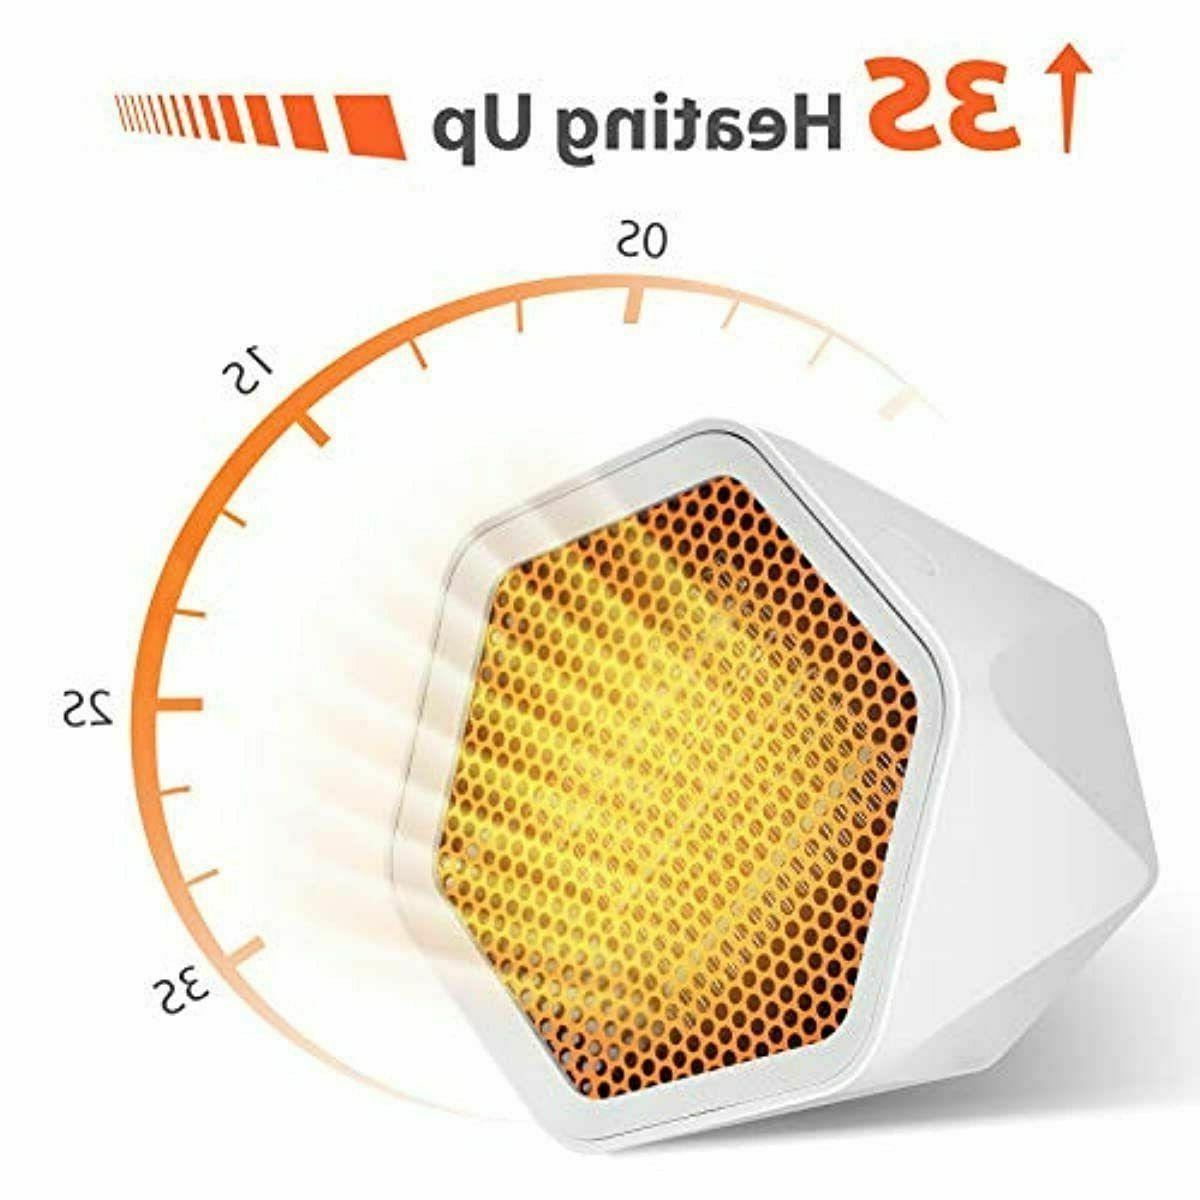 Gocheer Space Heater, 2-1 Heating Thermostat WHITE